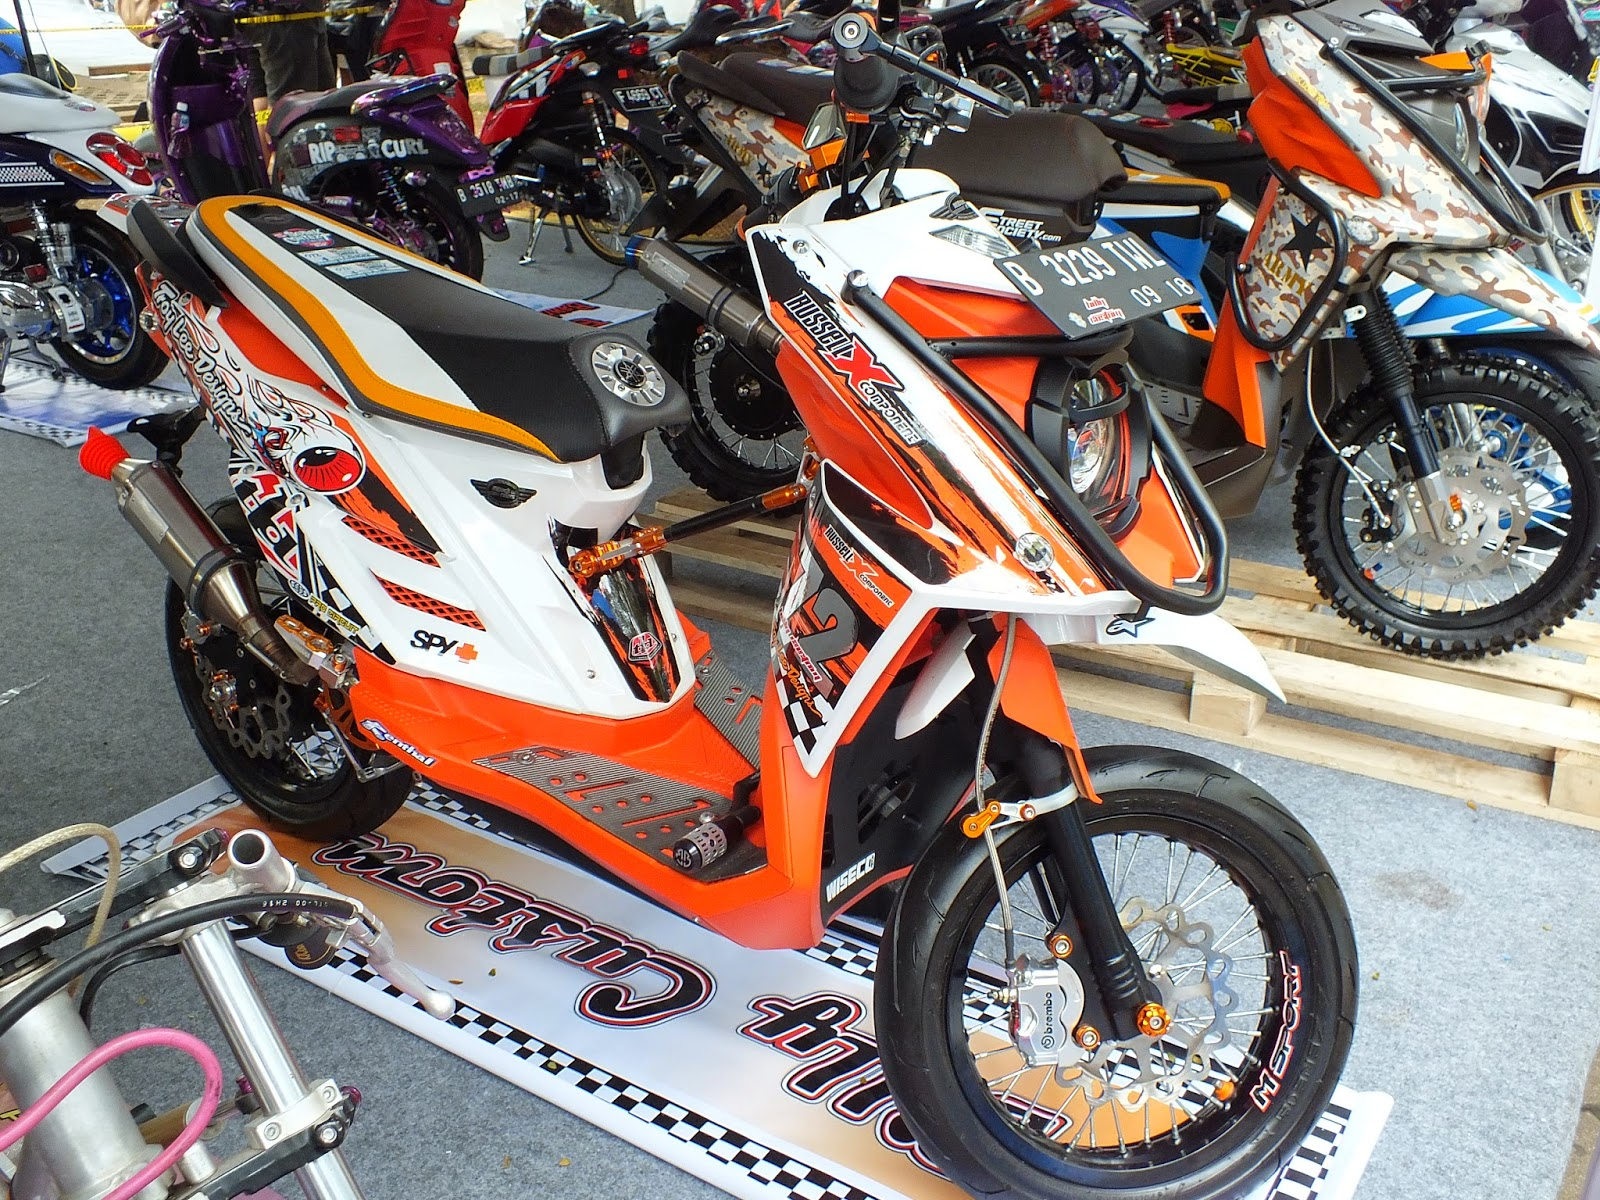 99 Foto Modifikasi Motor Yamaha X Ride TeaModifikasi